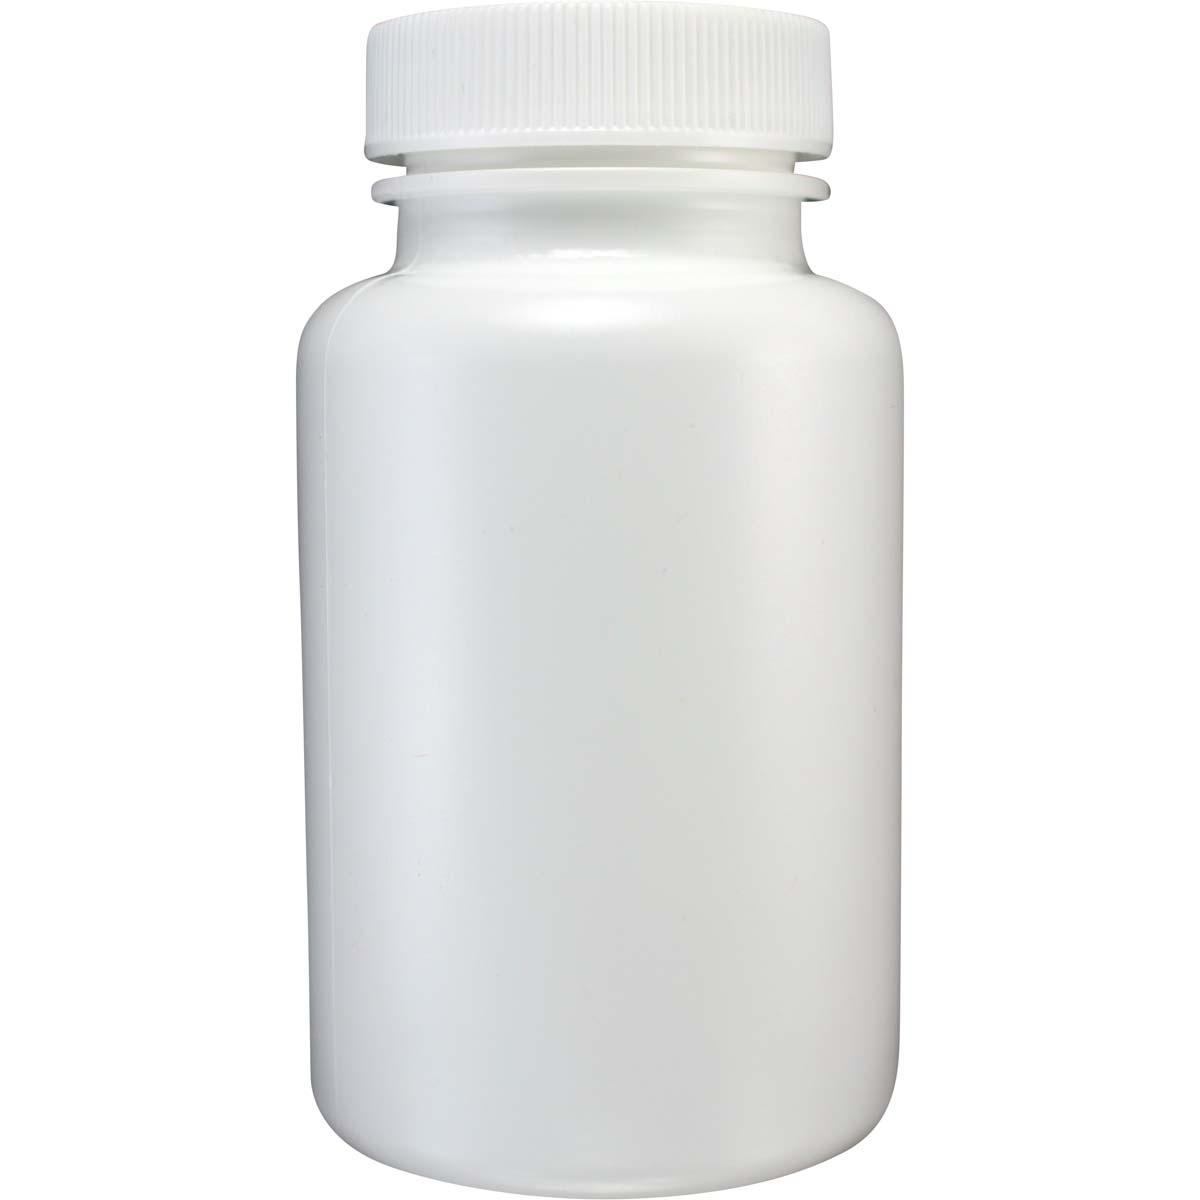 Empty Bottles Hdpe Bottles White Plastic 7oz Size